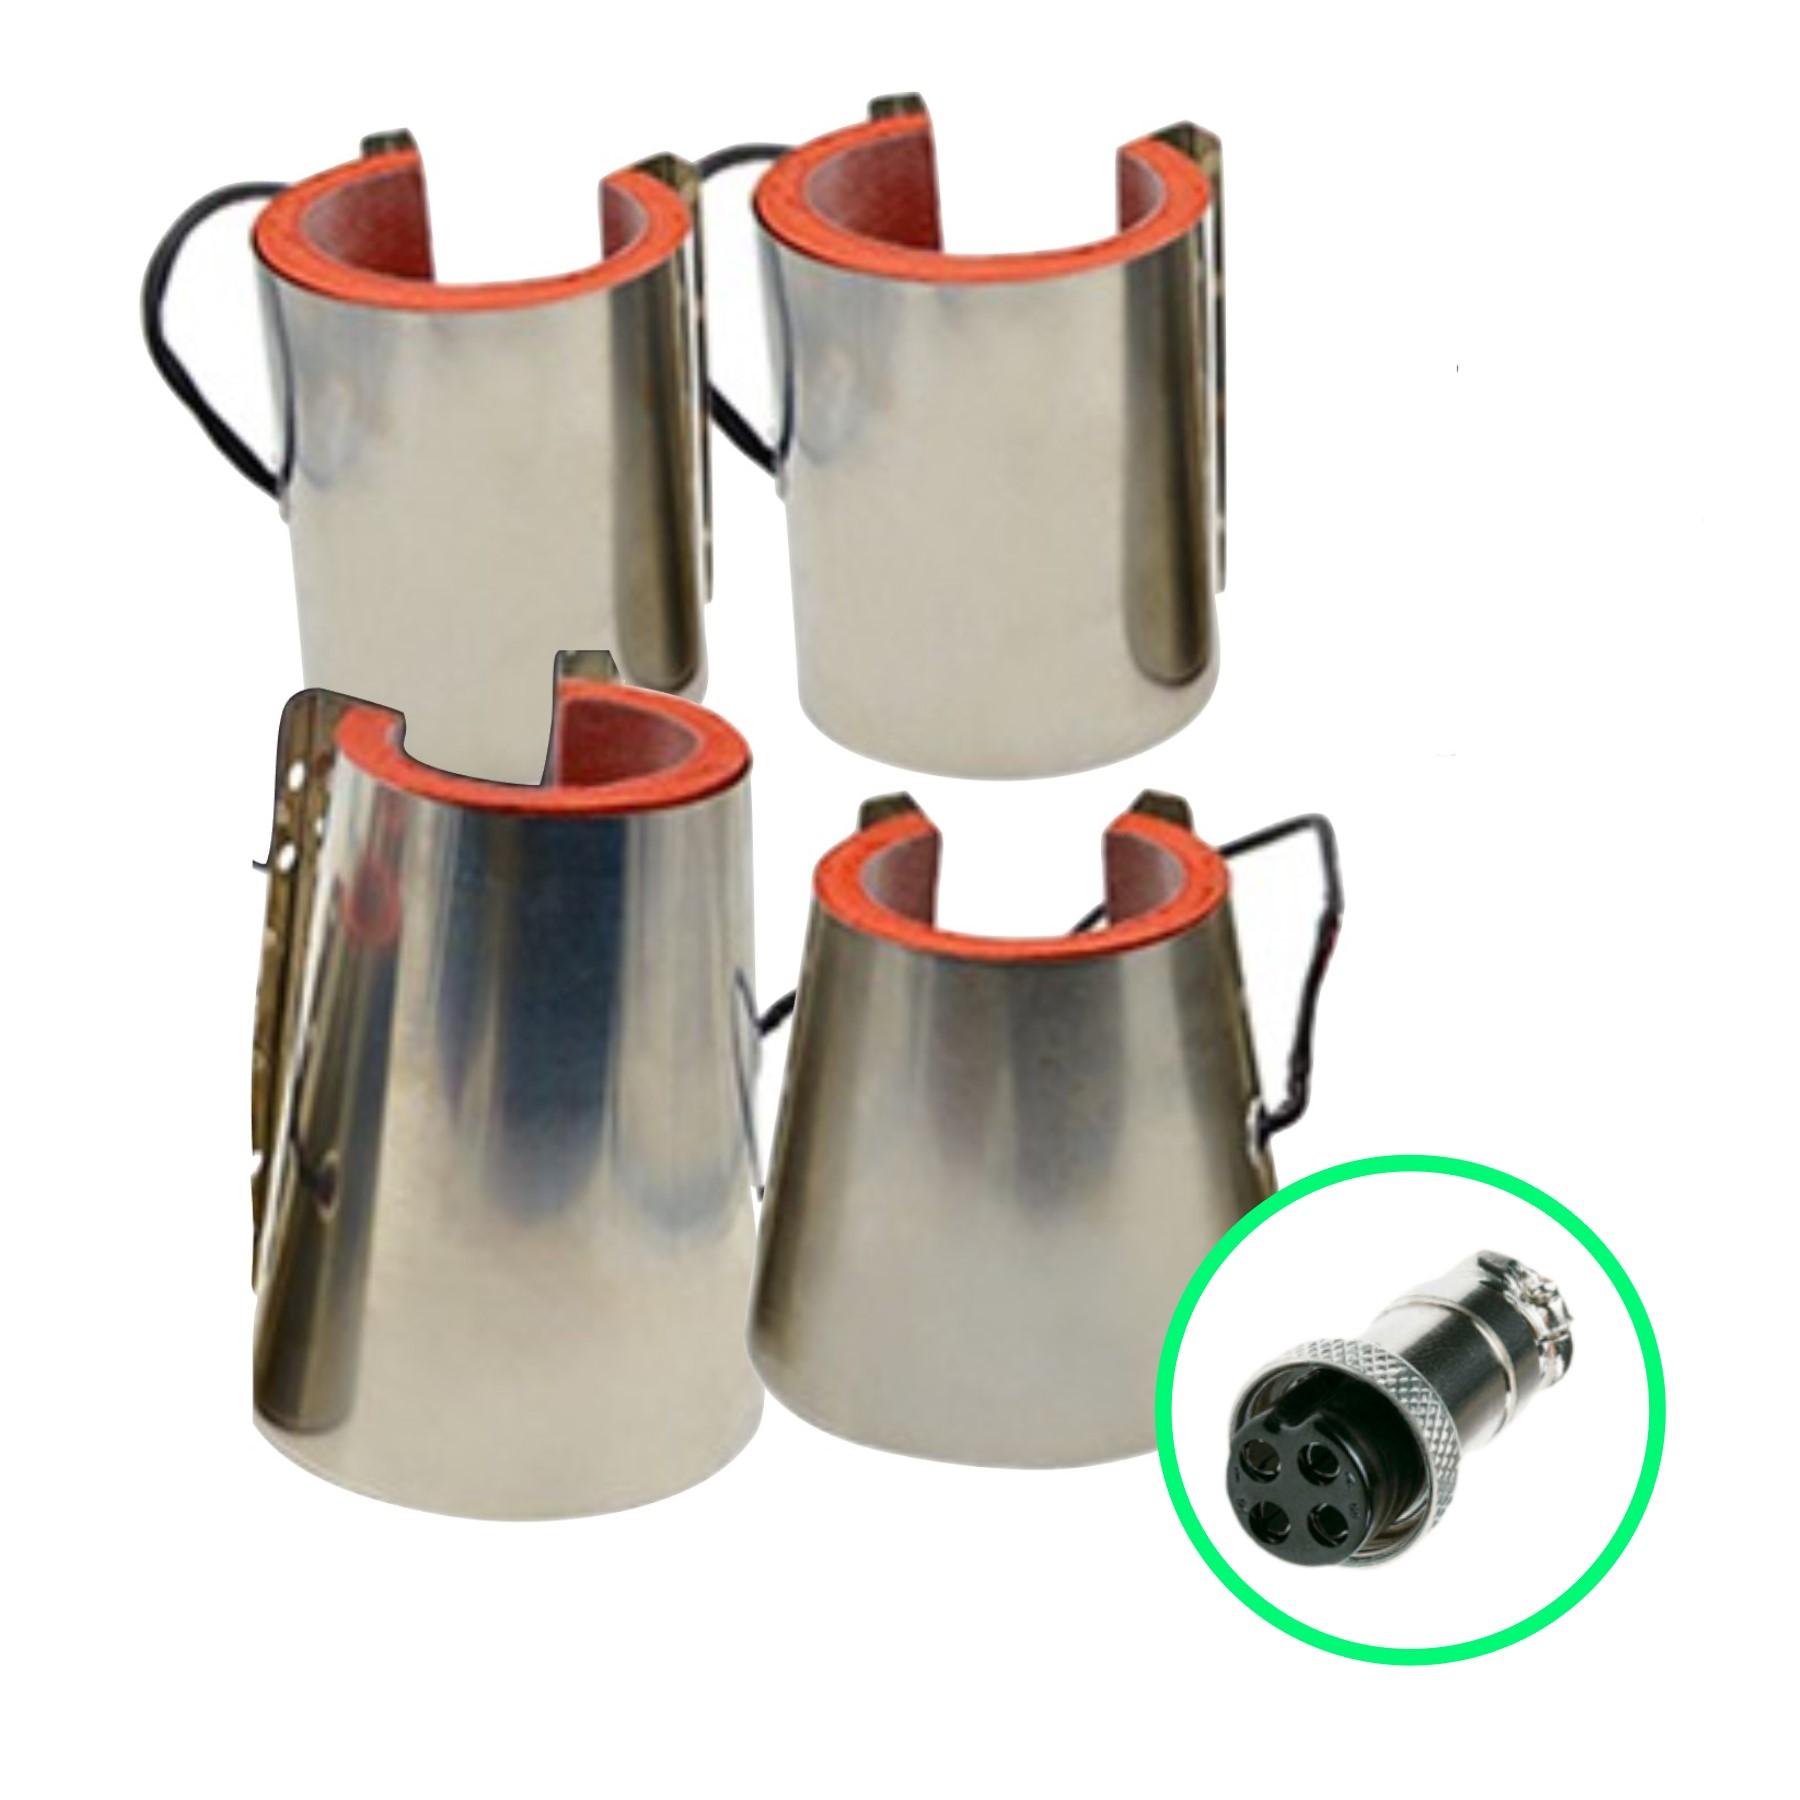 Accesorios para Mug Press GS-201M